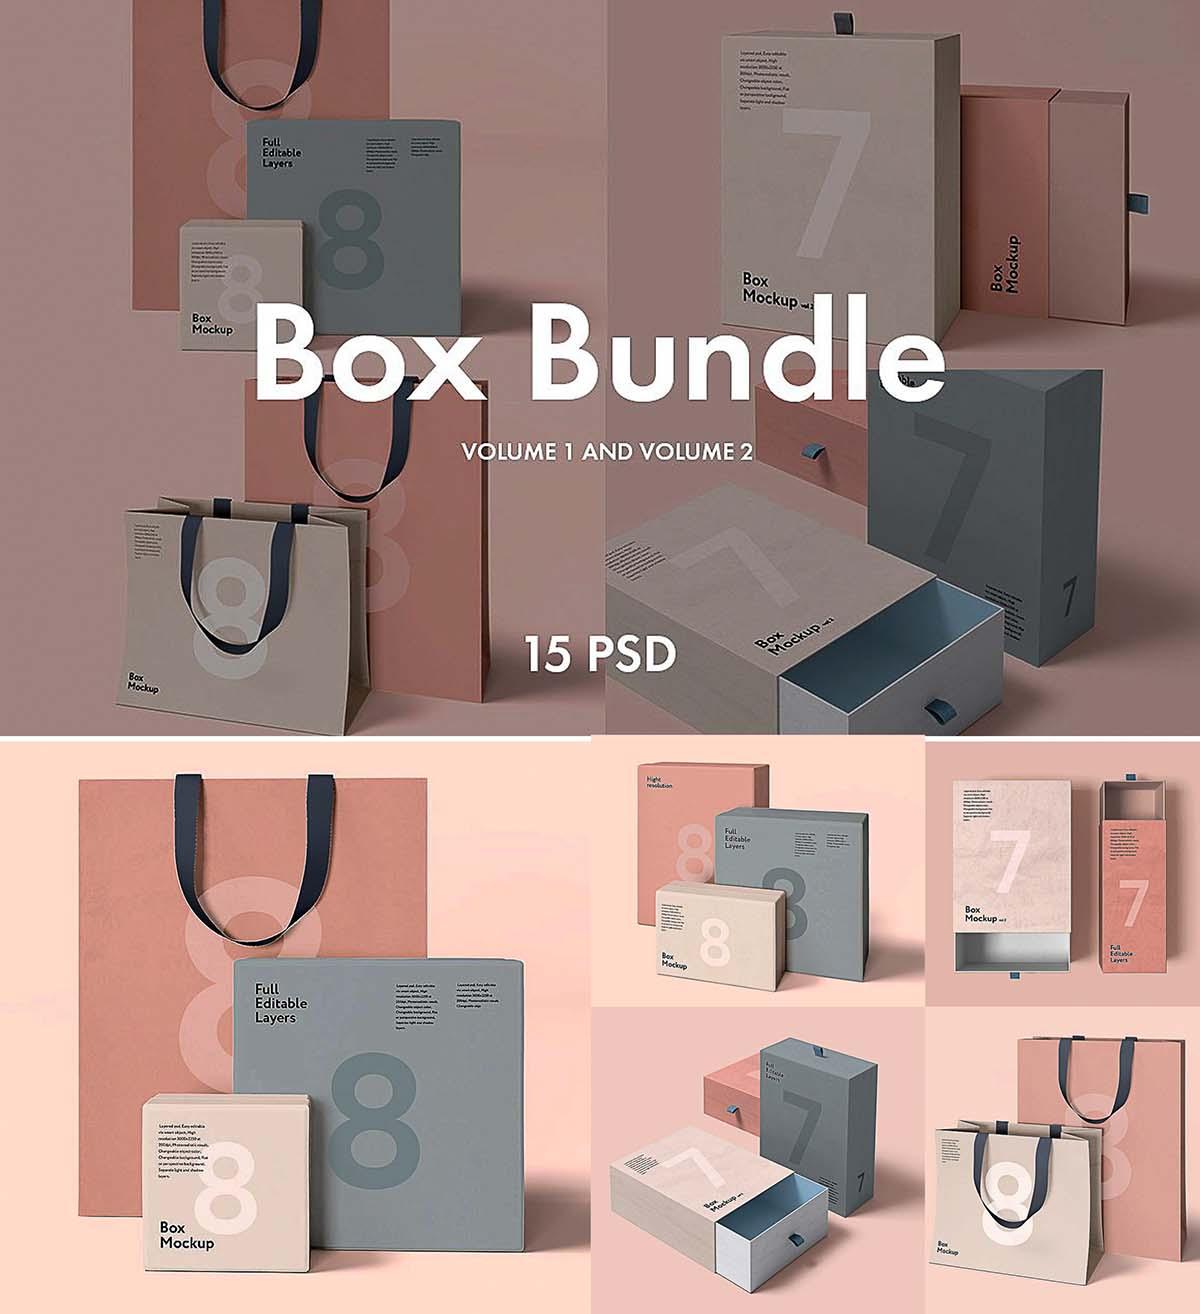 Box and bag mockup